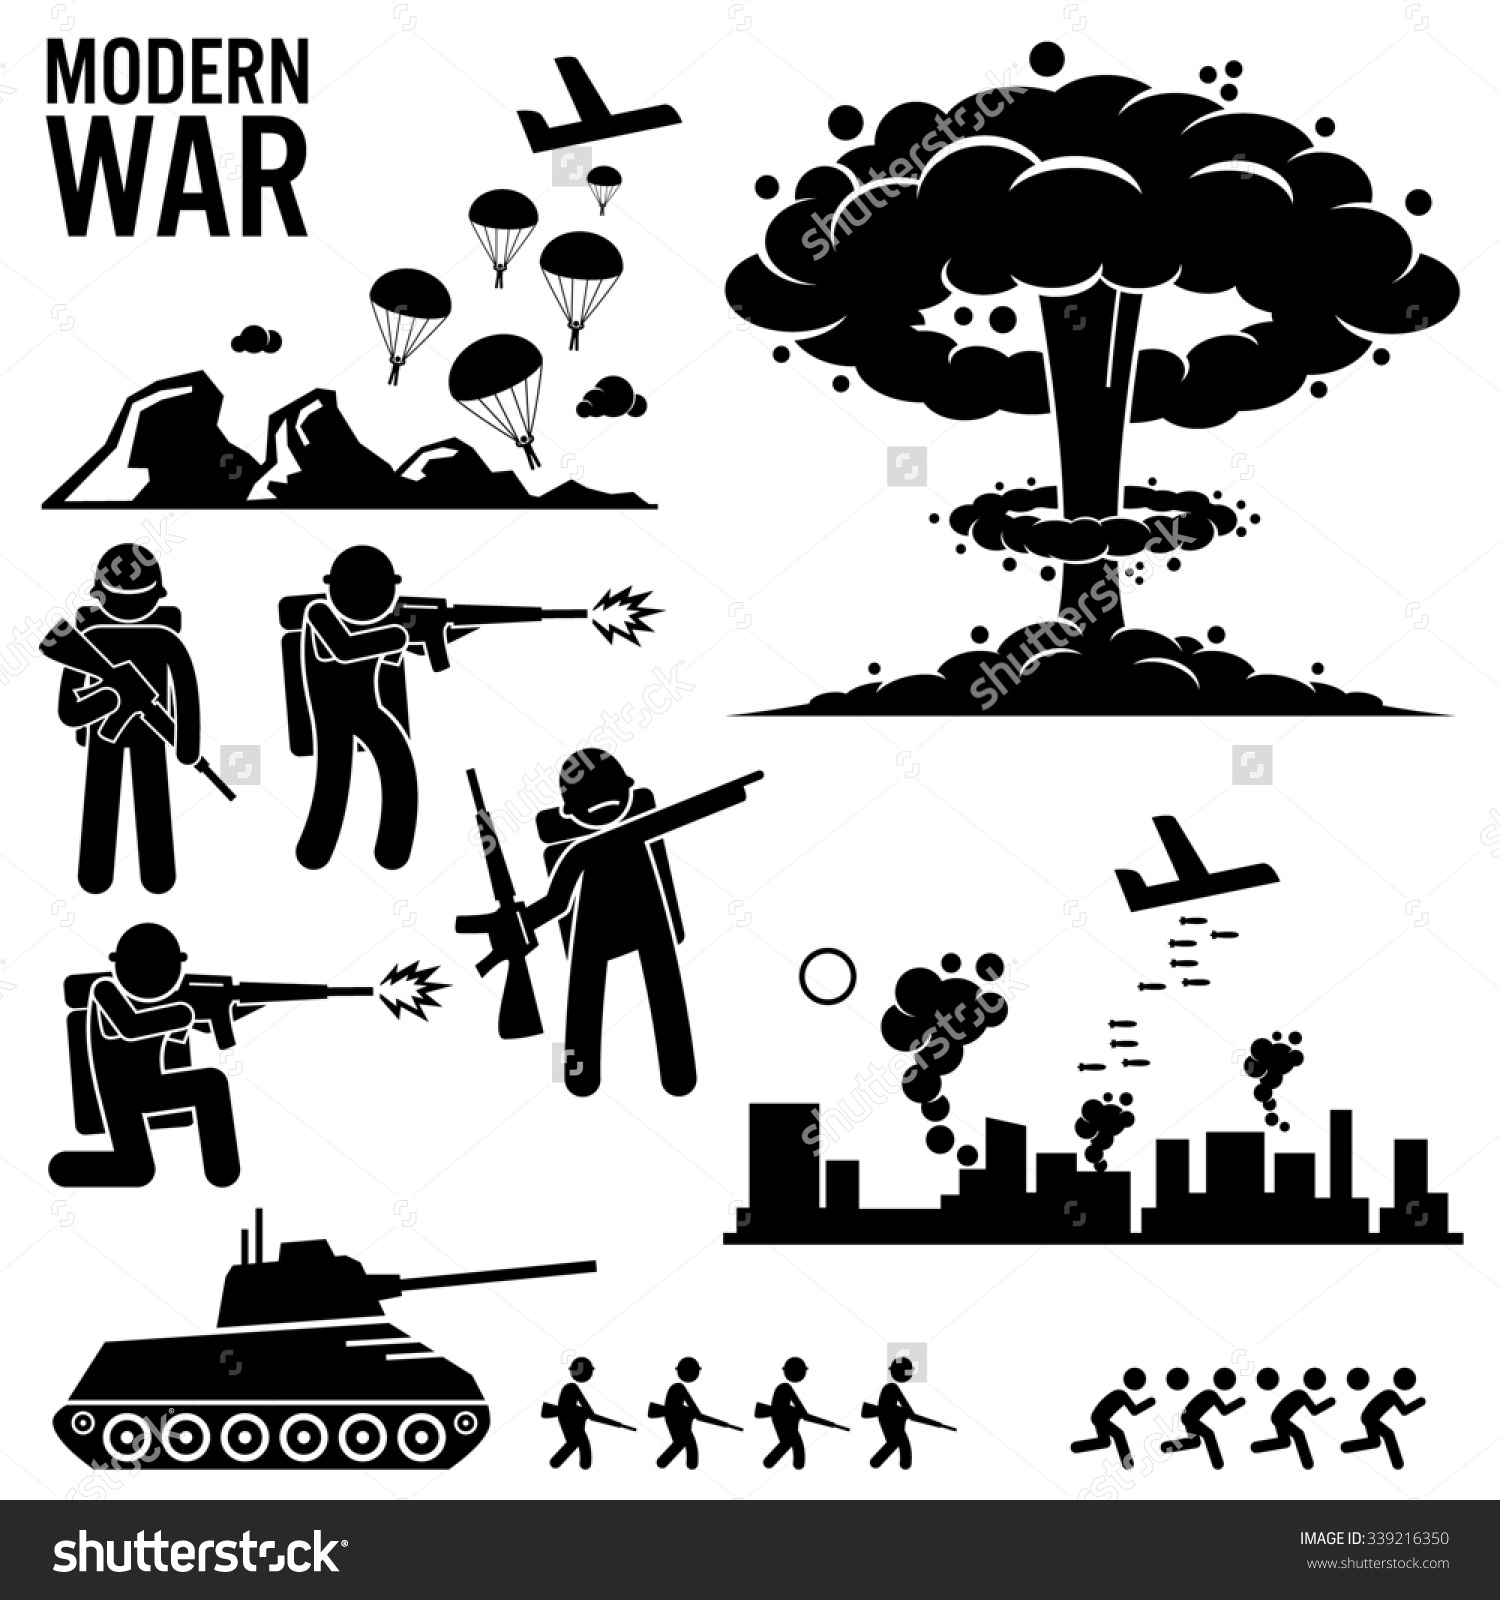 War Modern Warfare Nuclear Bomb Soldier Stock Illustration.